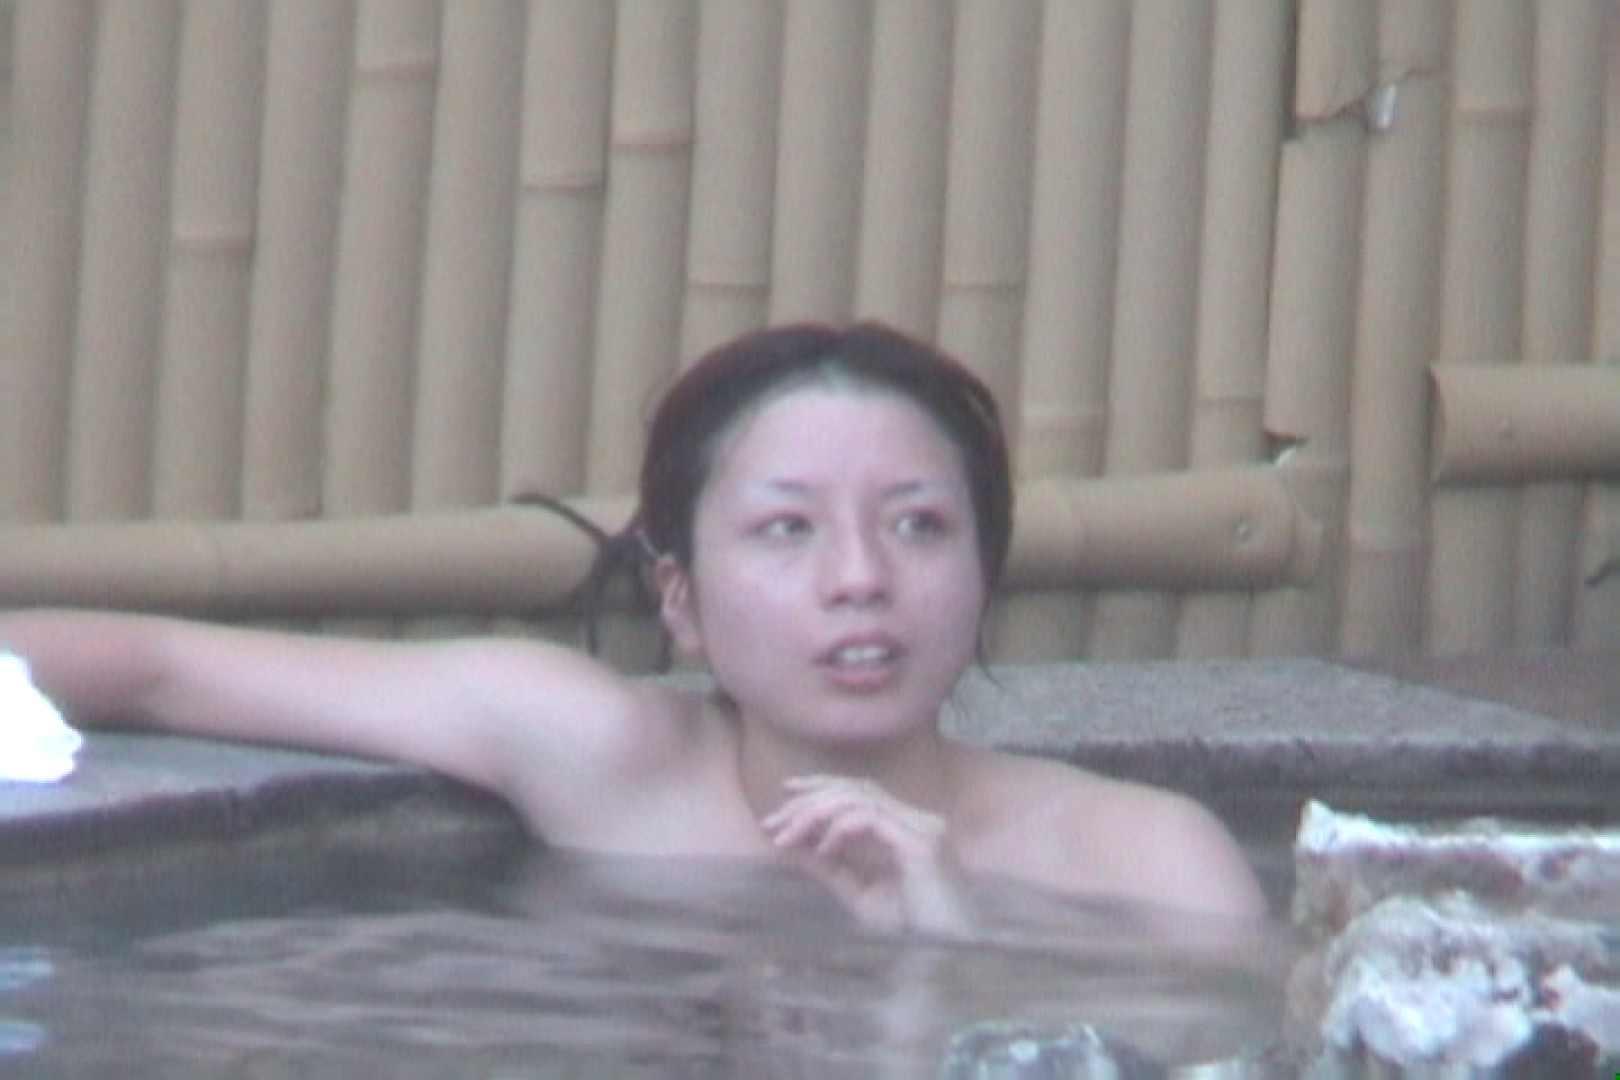 Aquaな露天風呂Vol.608 HなOL | 盗撮  89pic 66